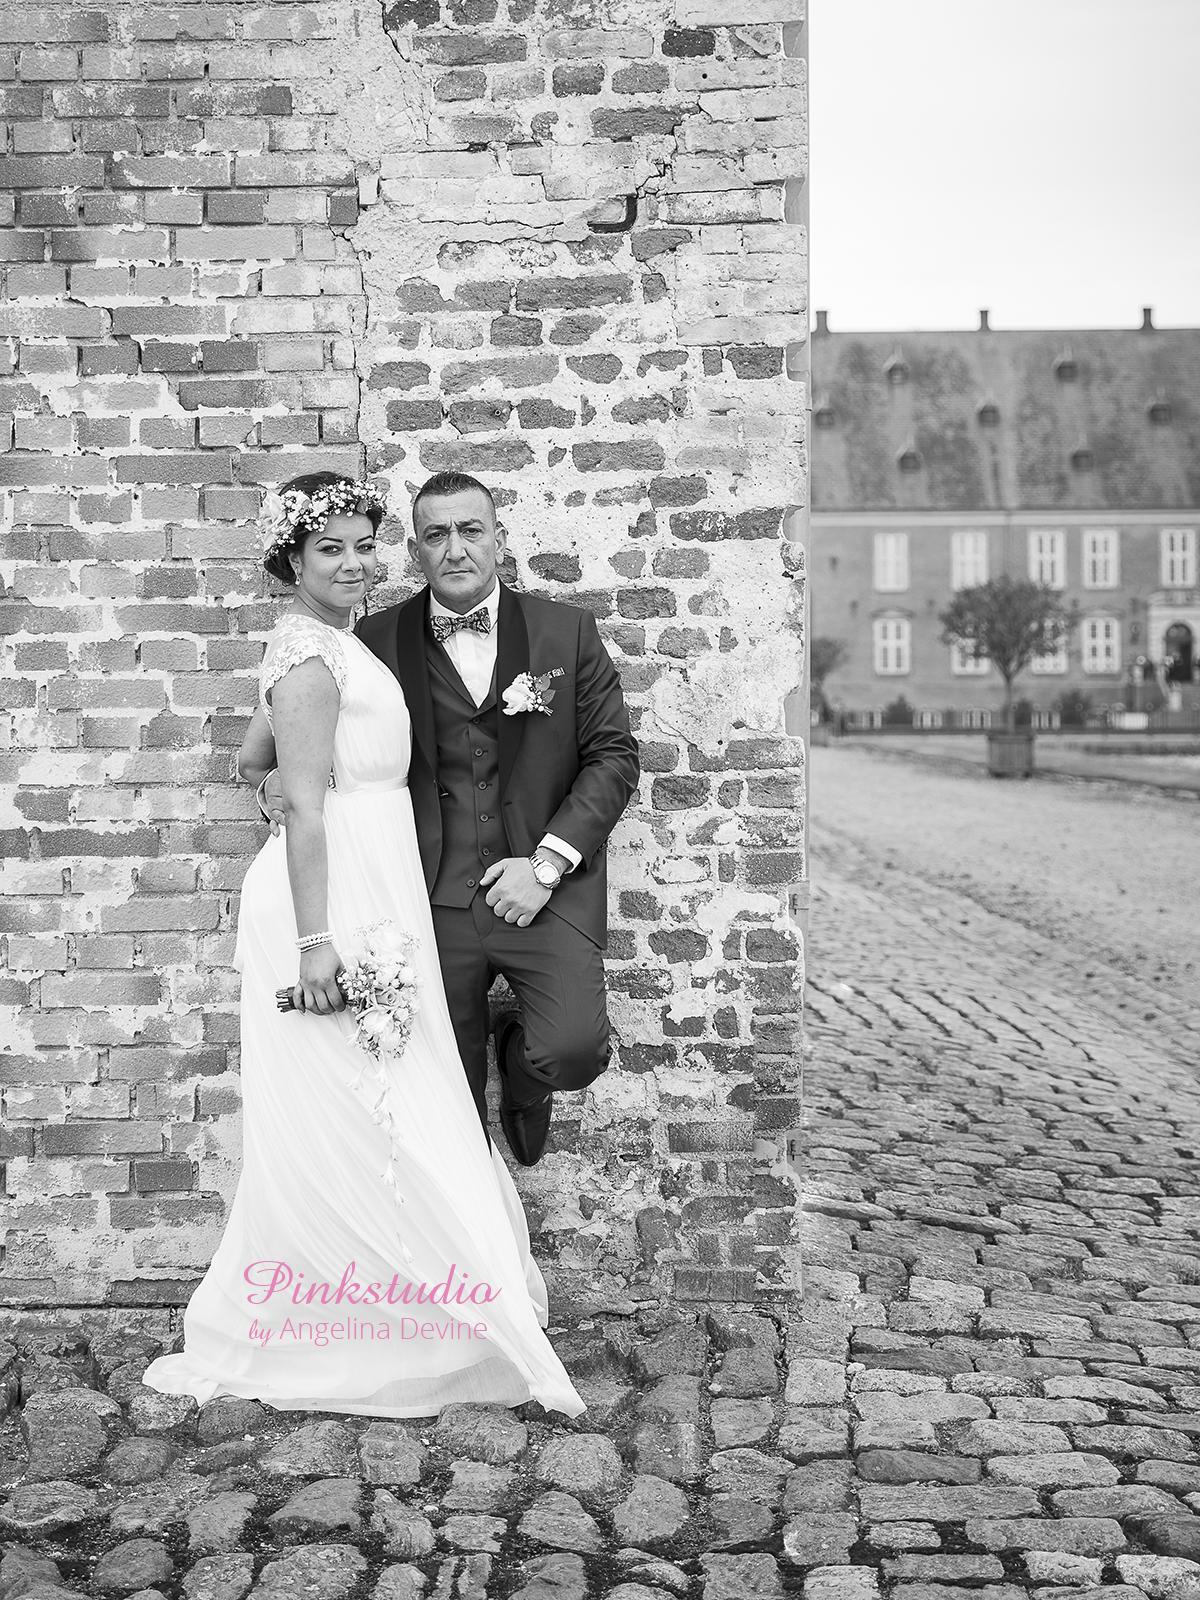 Pinkstudio by Angelina Devine 171A4291 Bryllupsfotografering